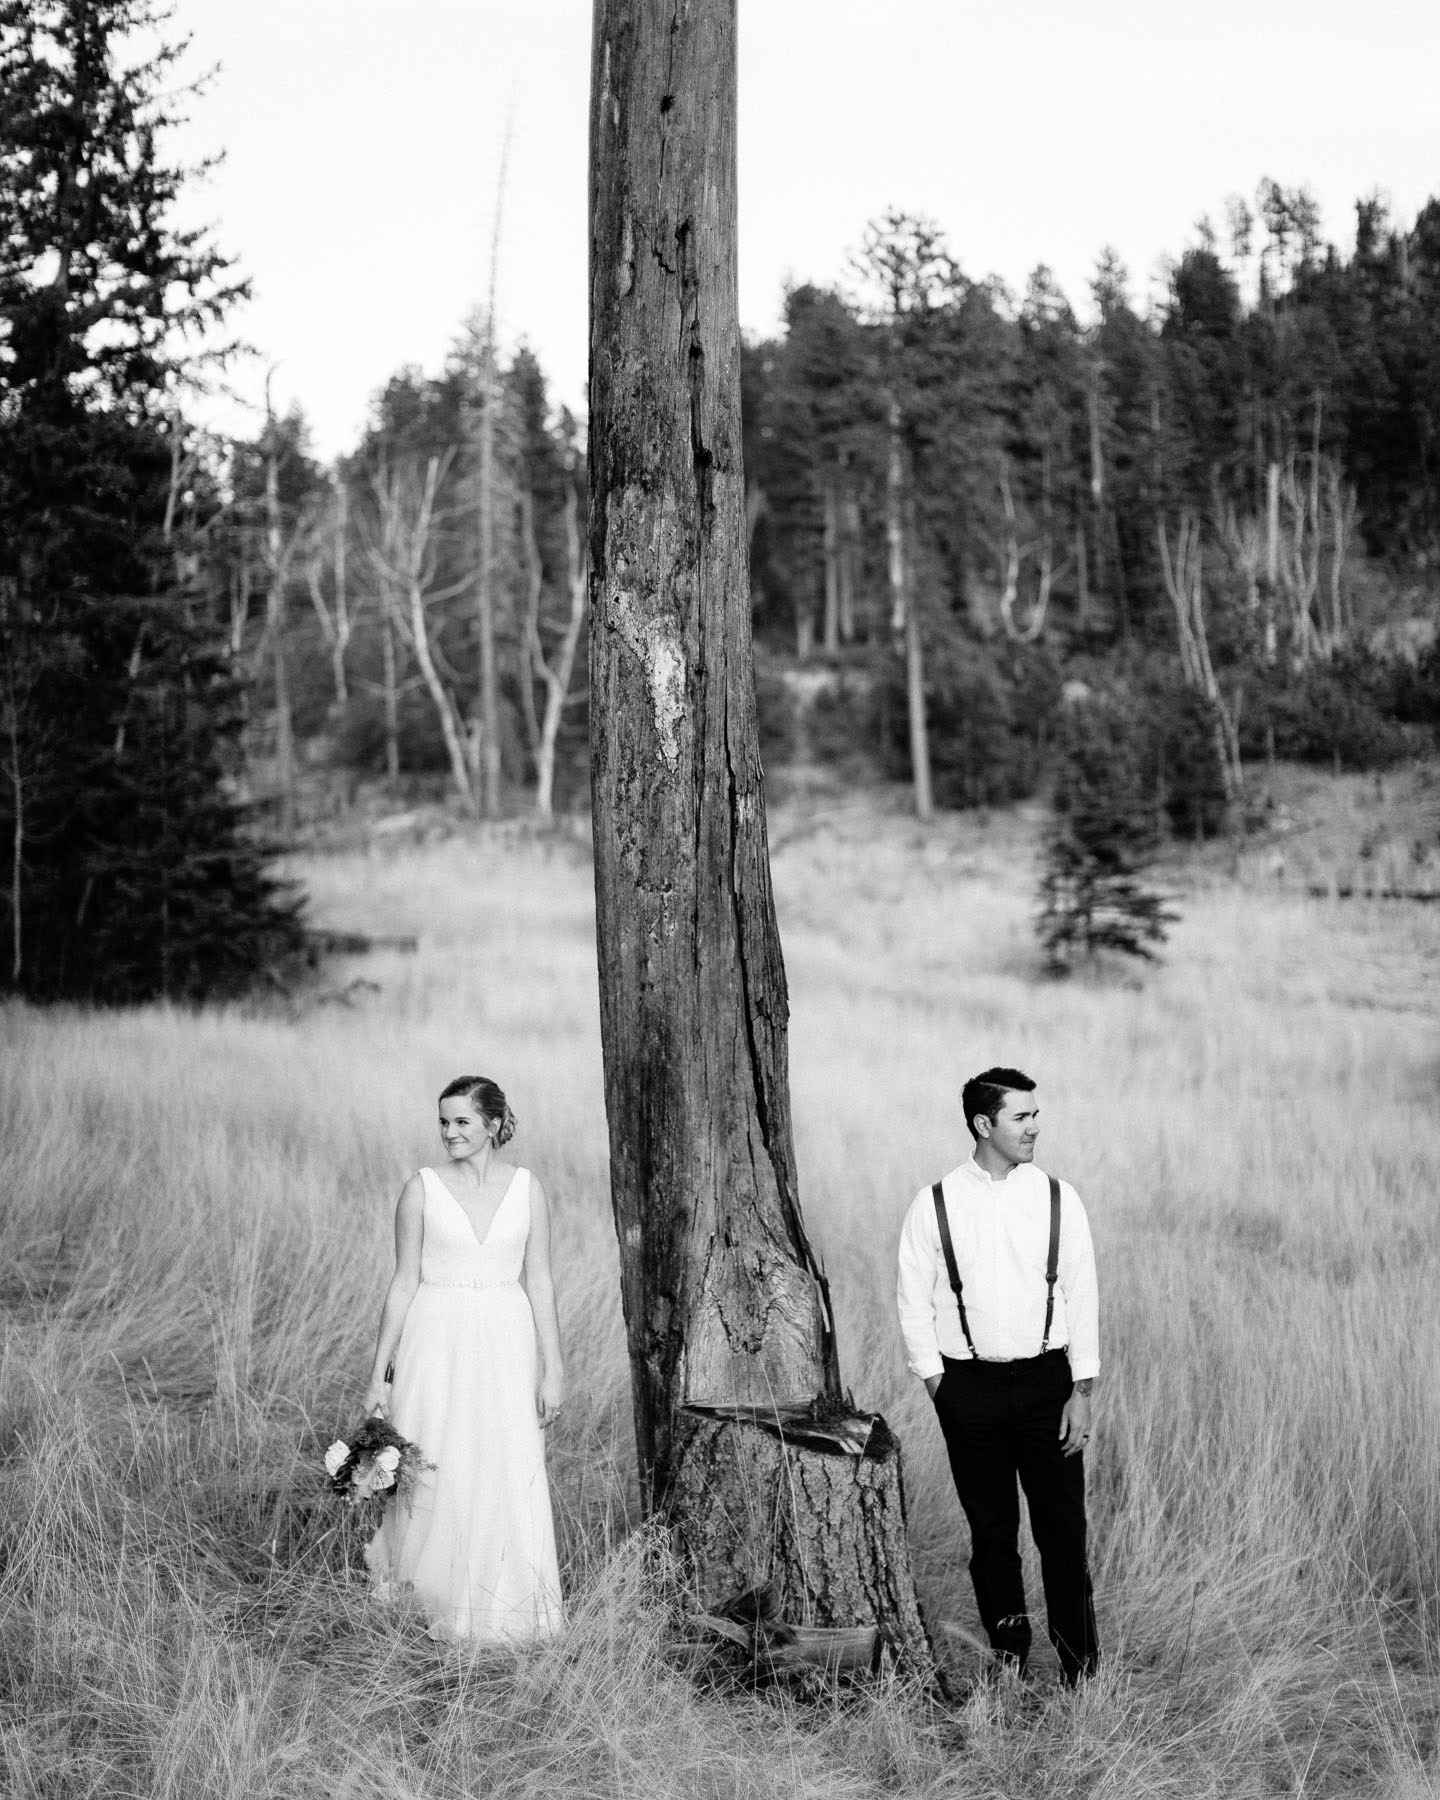 sioux-falls-black-hills-rapid-city-elopement-wedding-adventure-photographer-custer-sylvan-lake-38.jpg